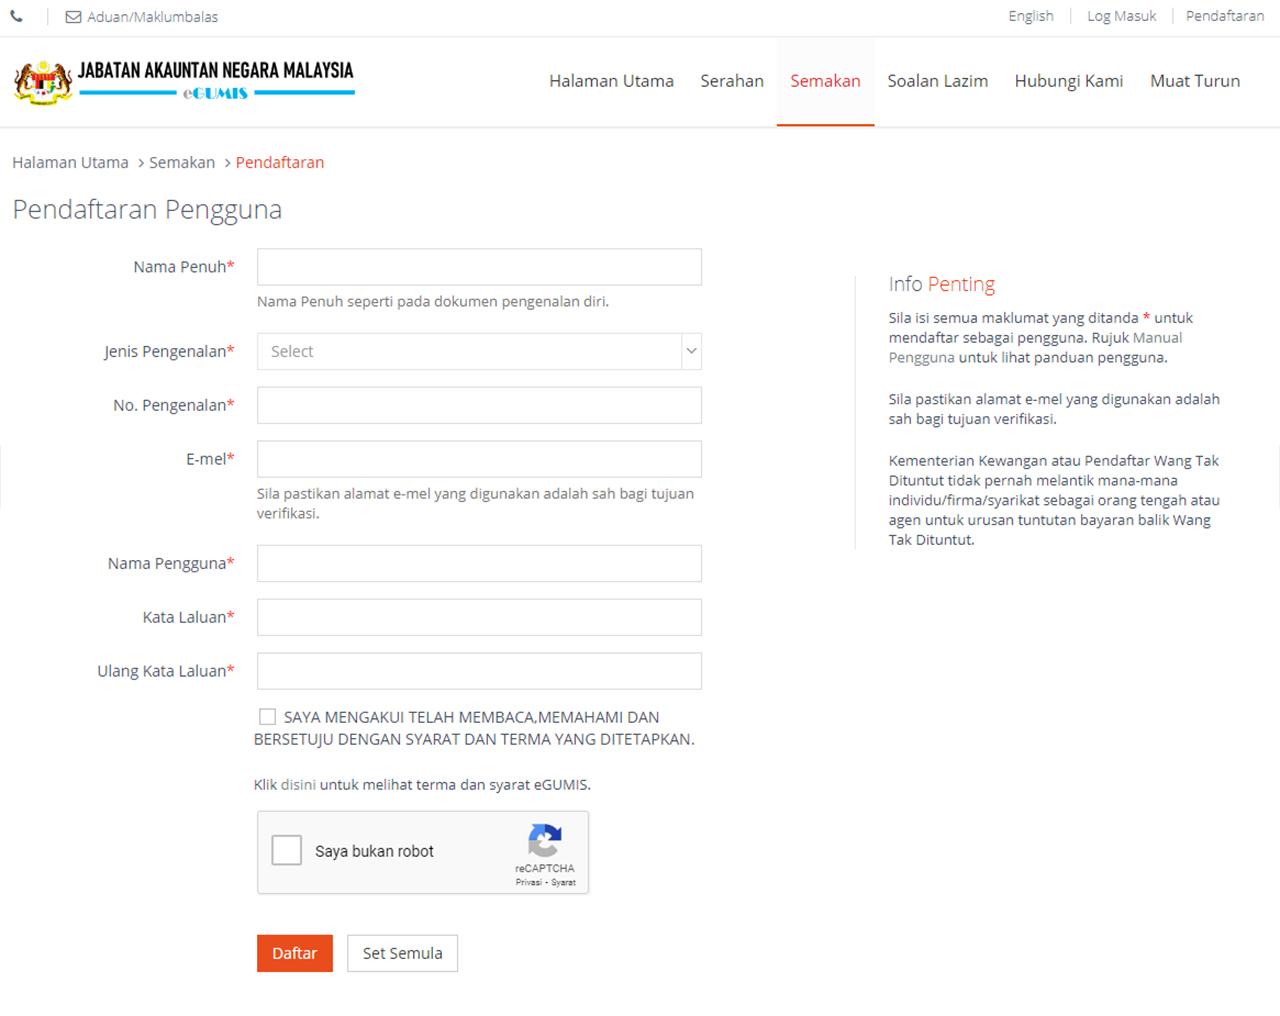 Cara Check Wang Tidak Dituntut (WTD) Secara Online